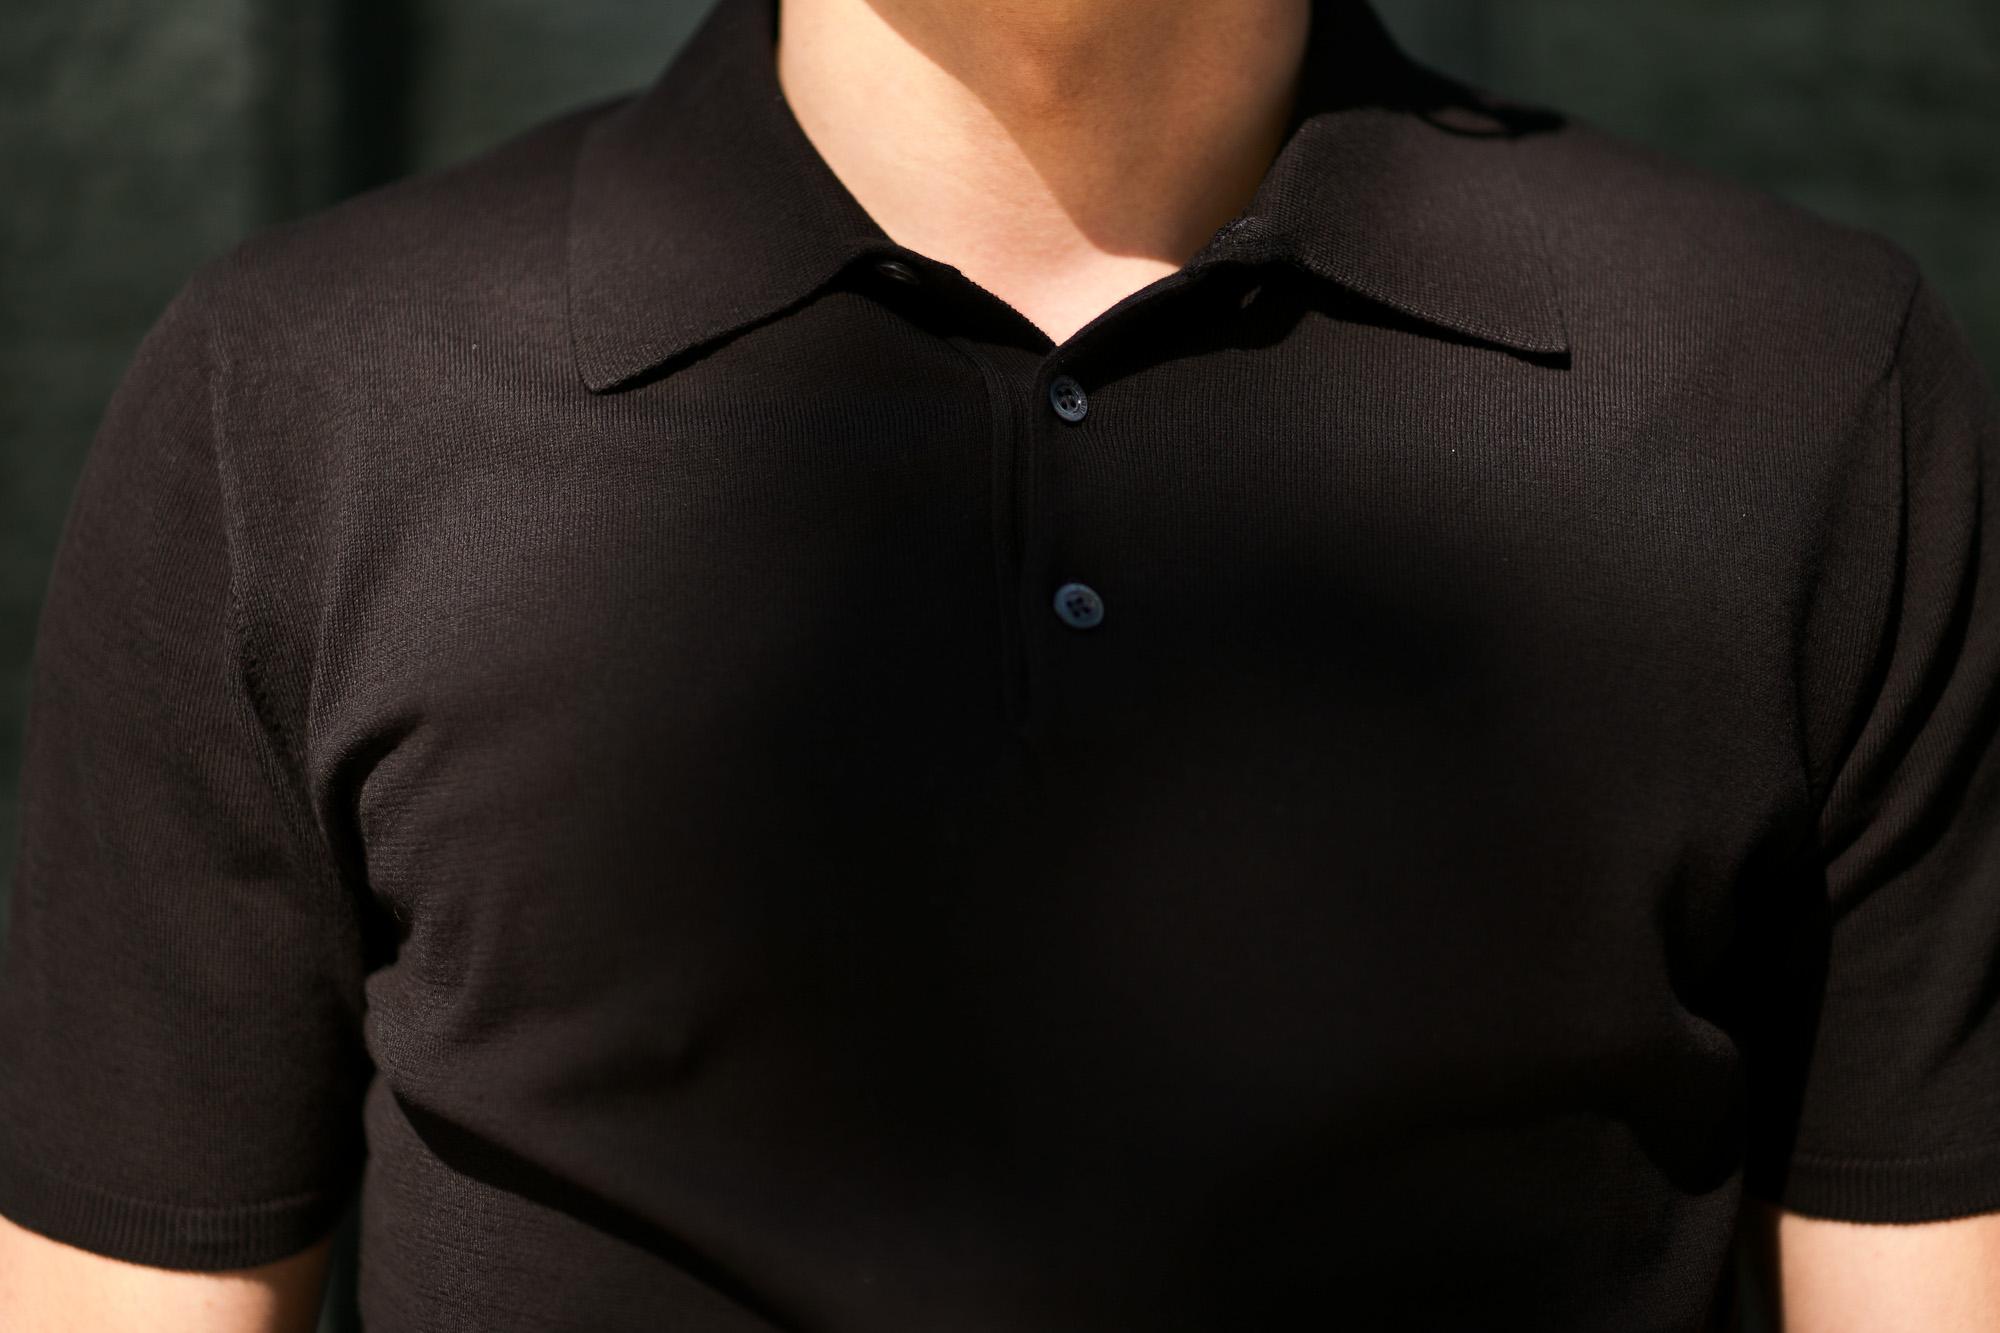 Cruciani (クルチアーニ) Knit Polo Shirt (ニット ポロシャツ) 27ゲージ コットン ニット ポロシャツ BLACK (ブラック・Z0048) made in italy (イタリア製) 2019 春夏新作 愛知 名古屋 altoediritto アルトエデリット